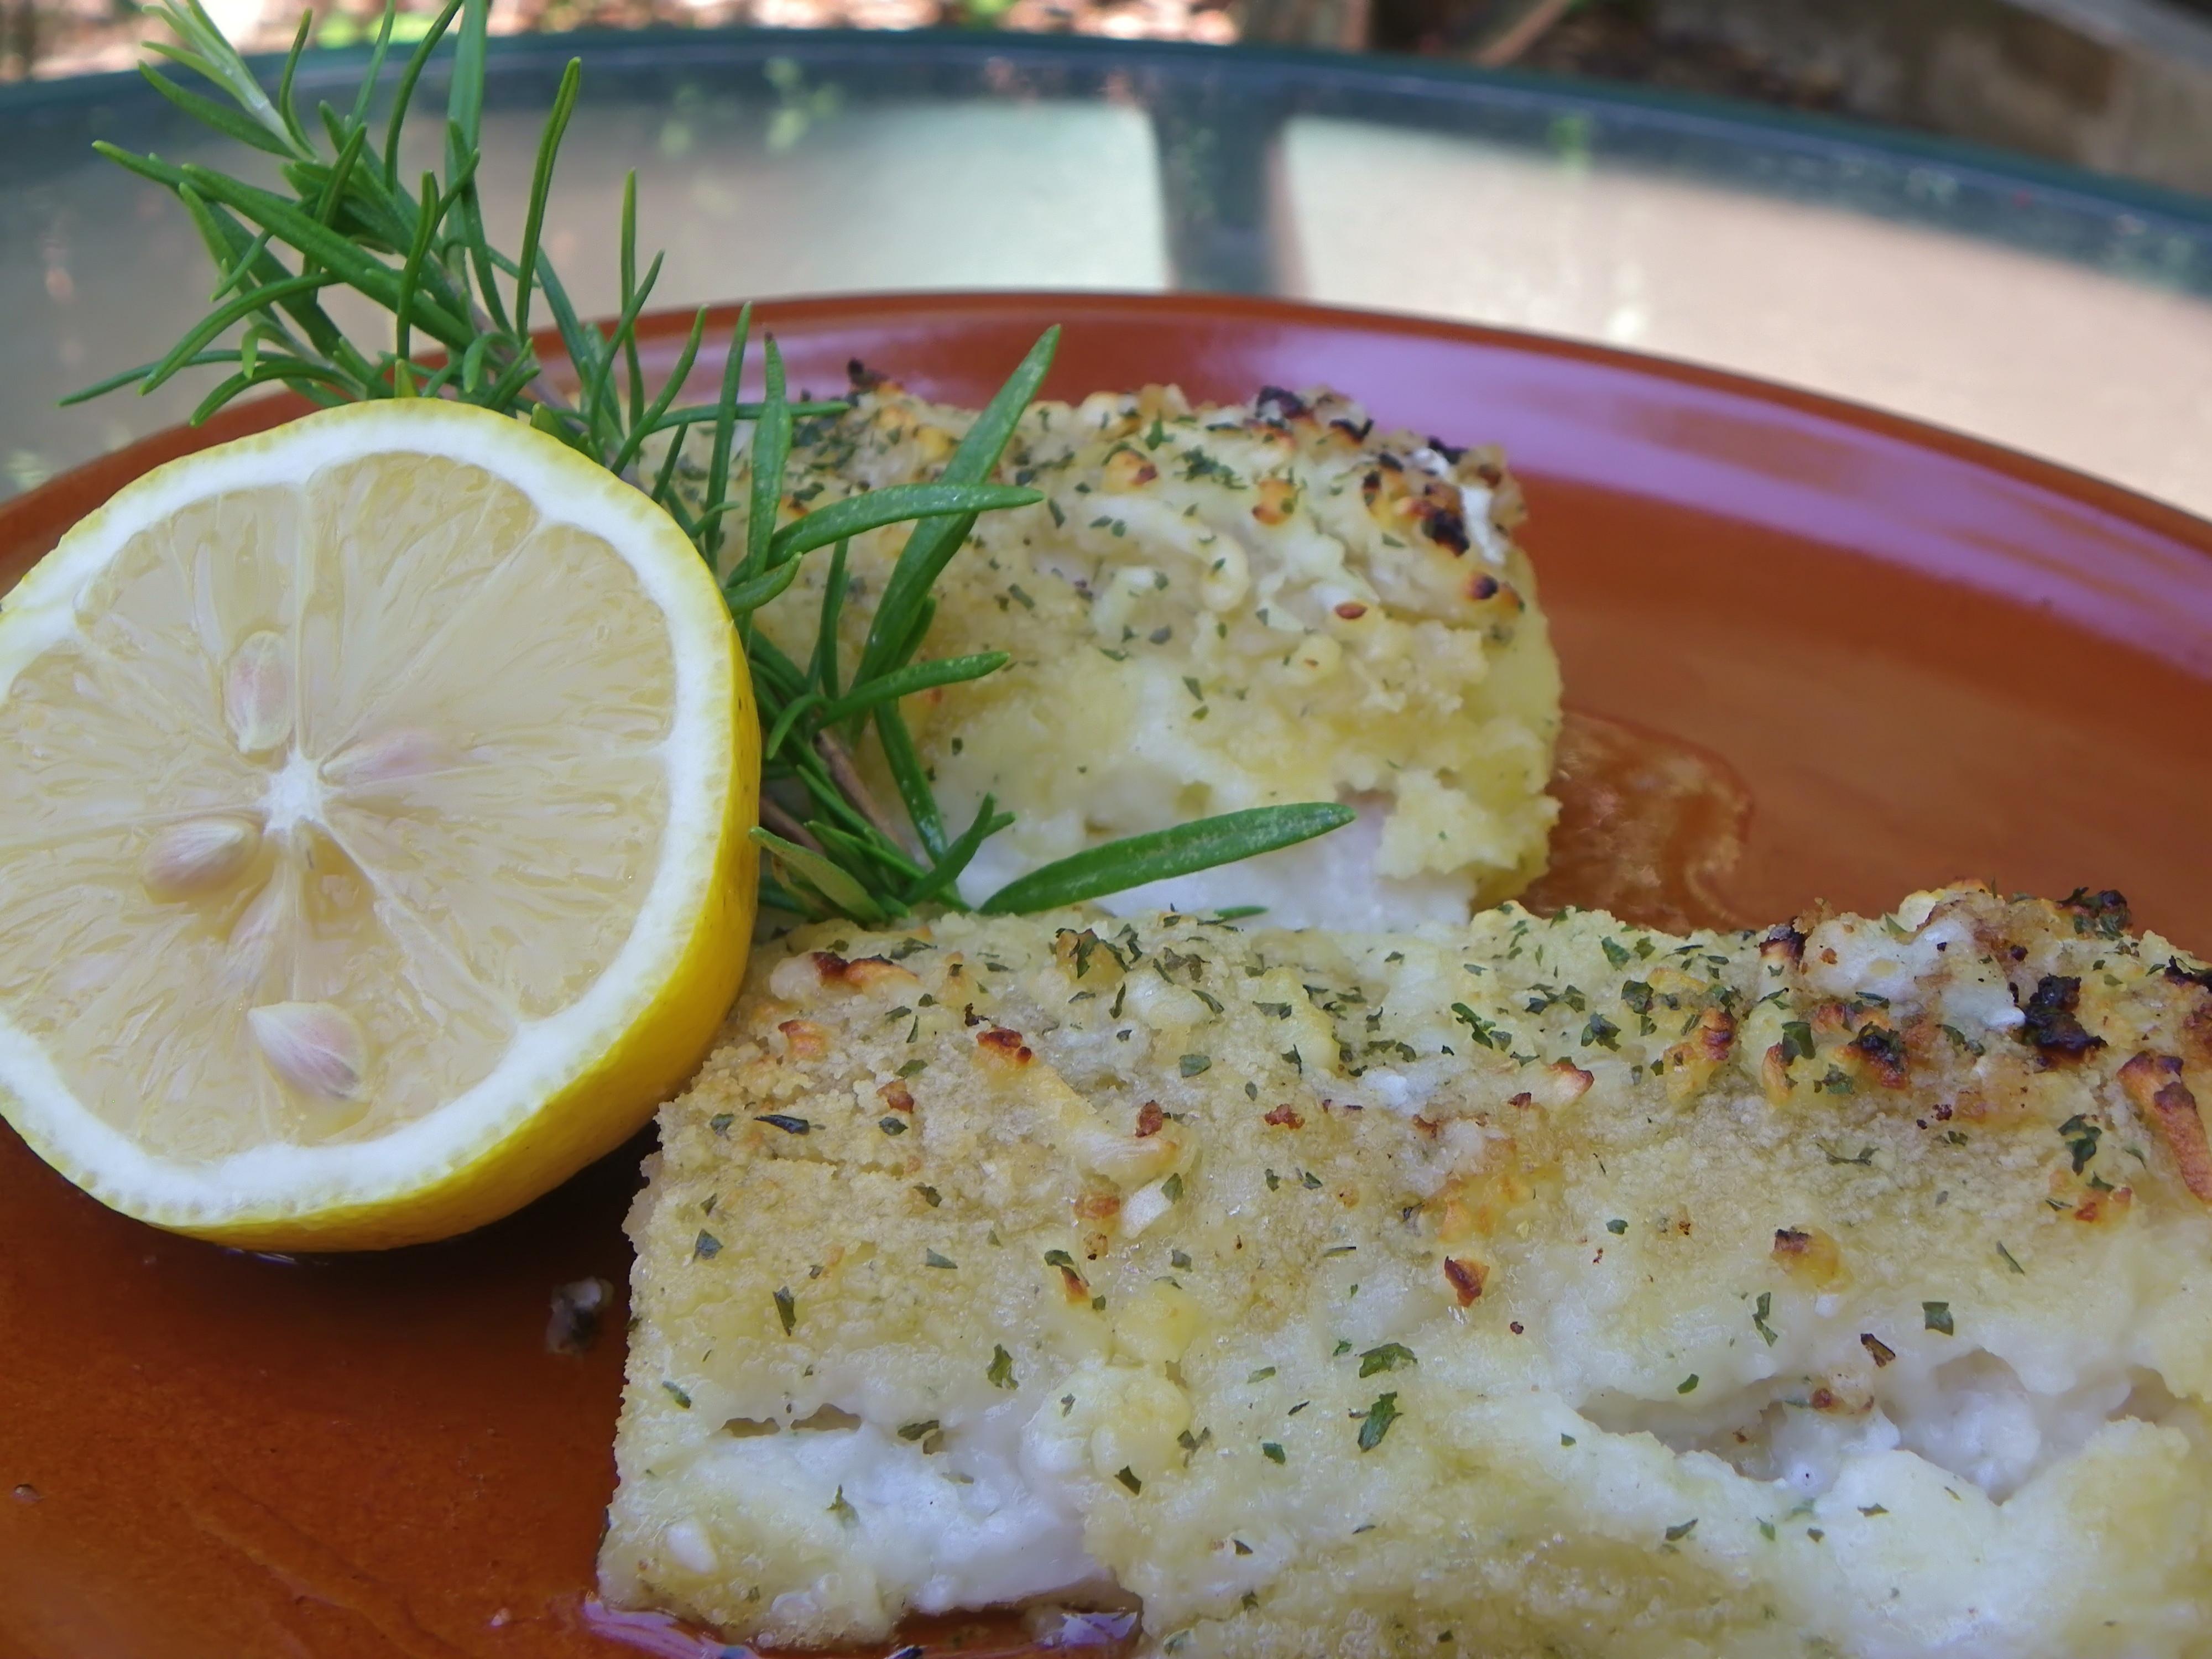 Bacalao al horno con pan rallado y ajo blue jellybeans - Cocinar bacalao congelado ...